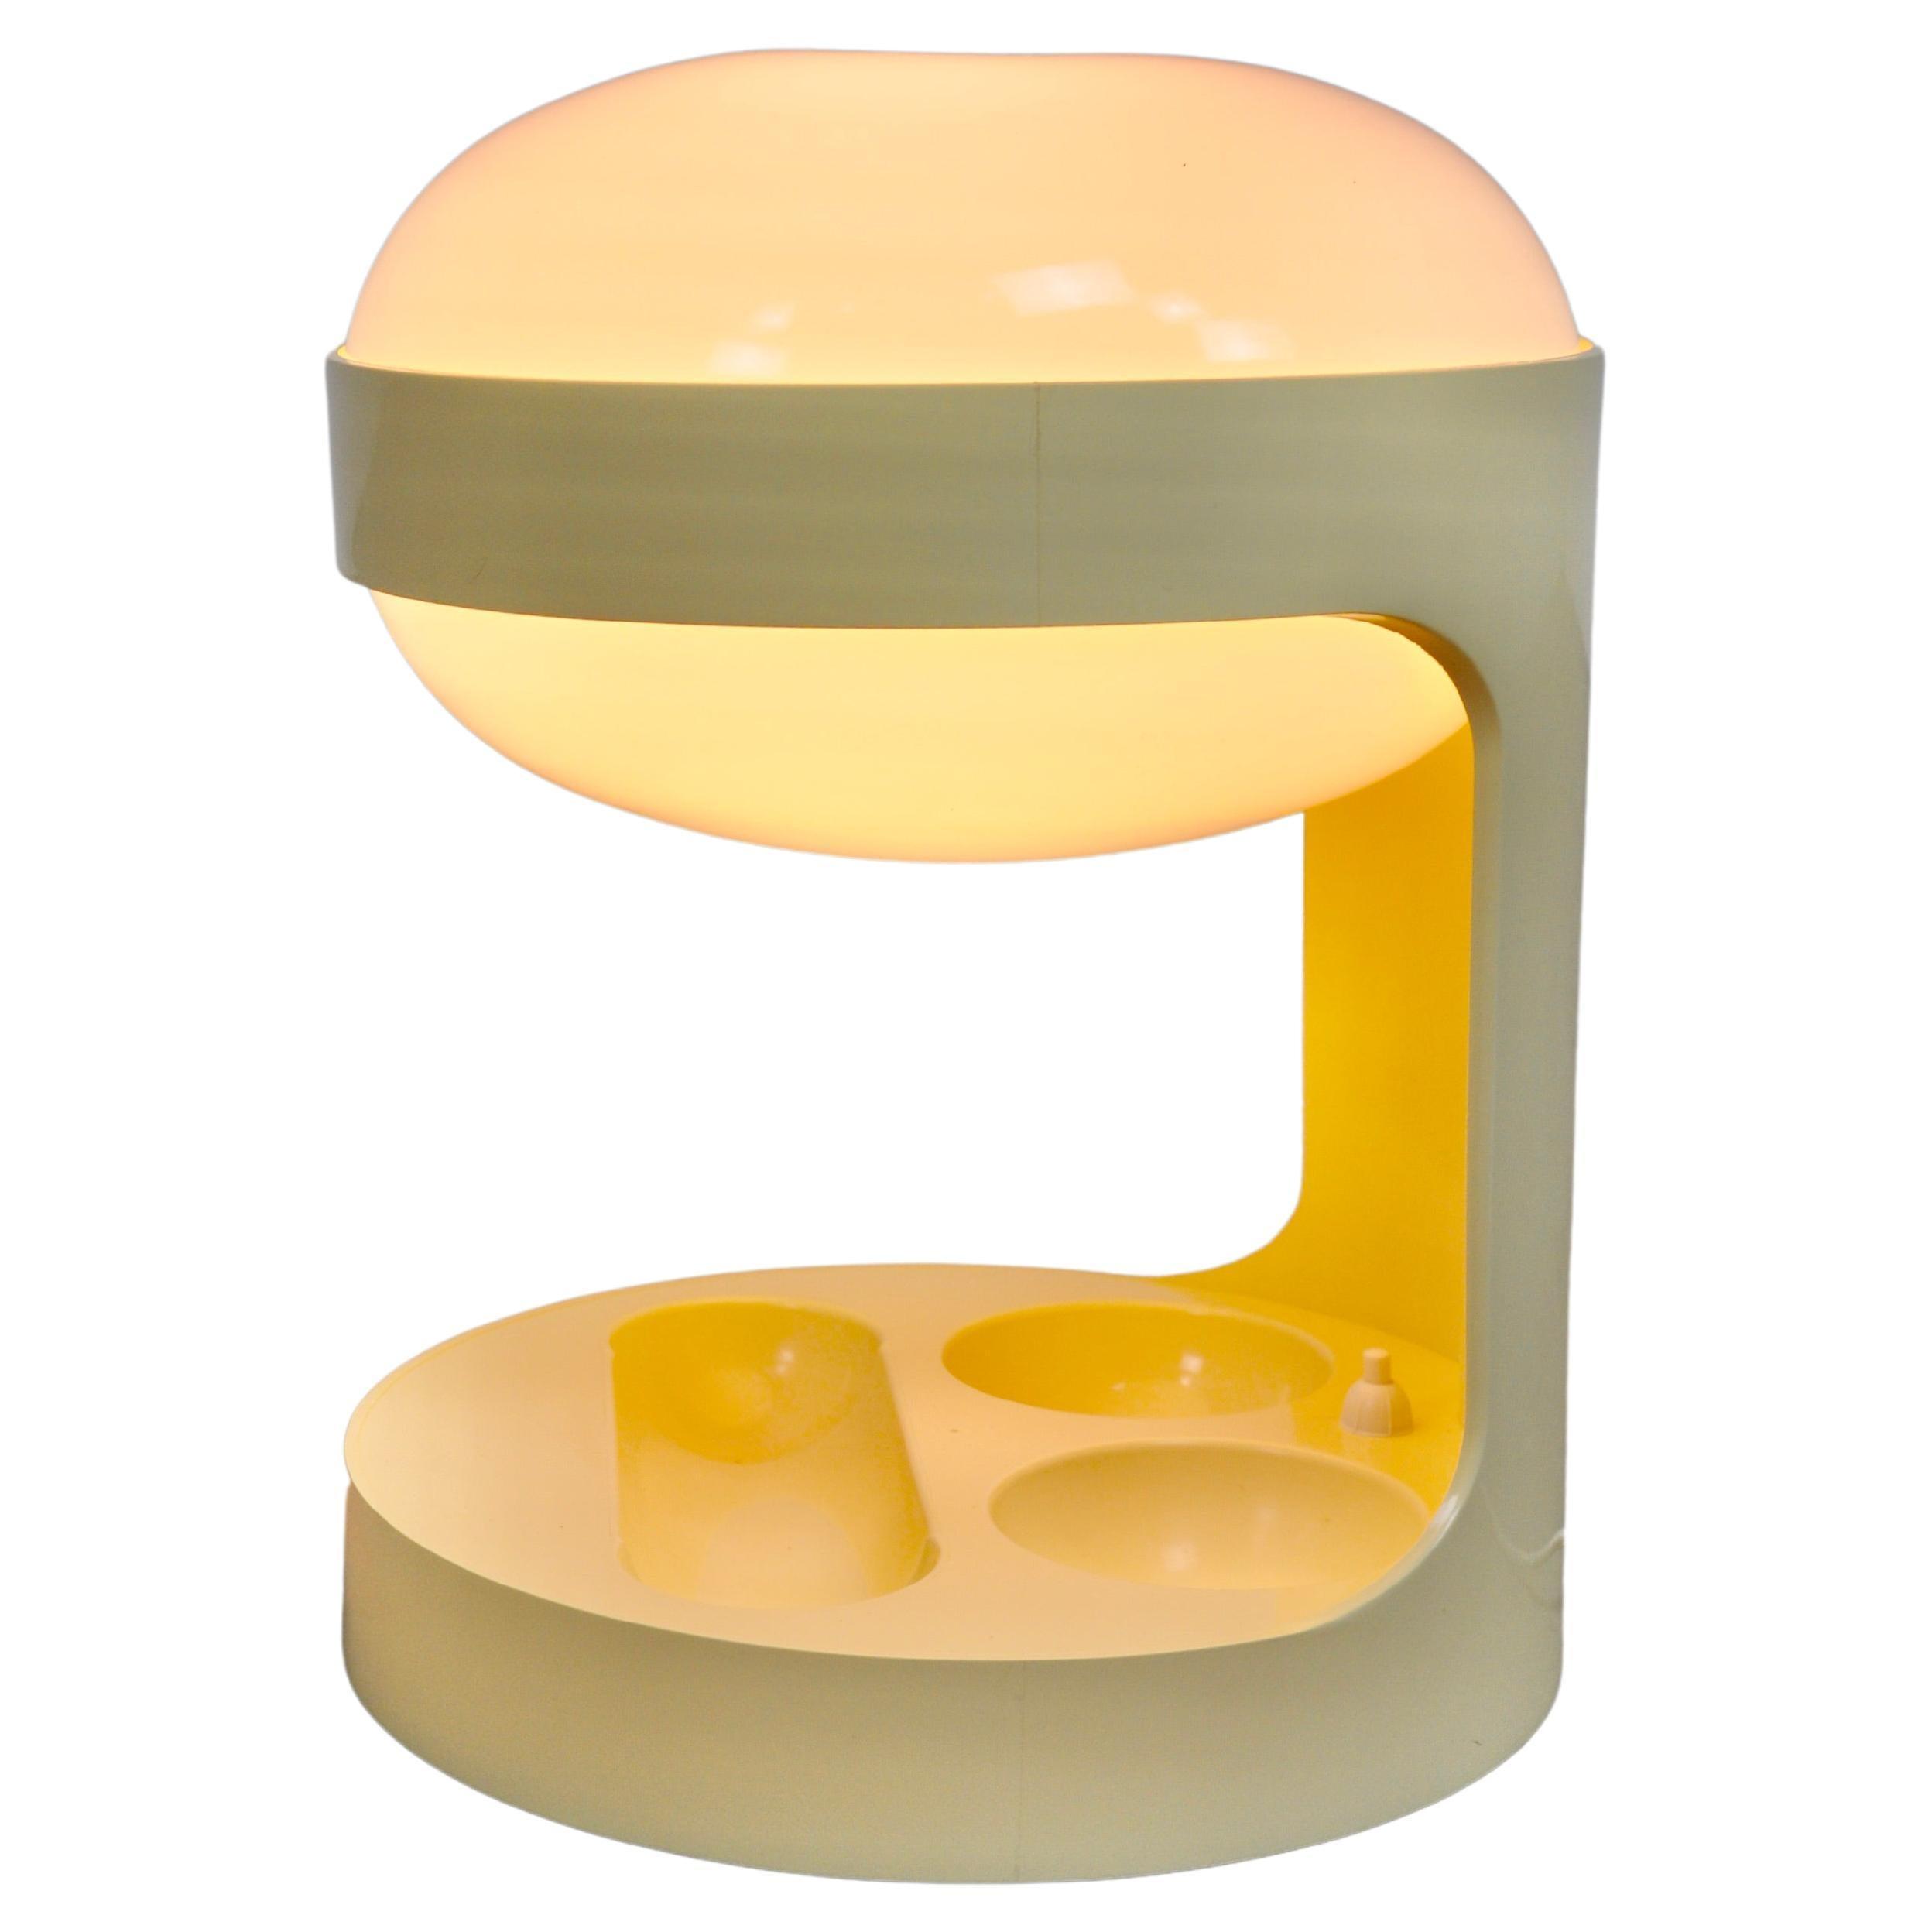 KD29 Table Lamp by Joe Colombo for Kartell, 1967